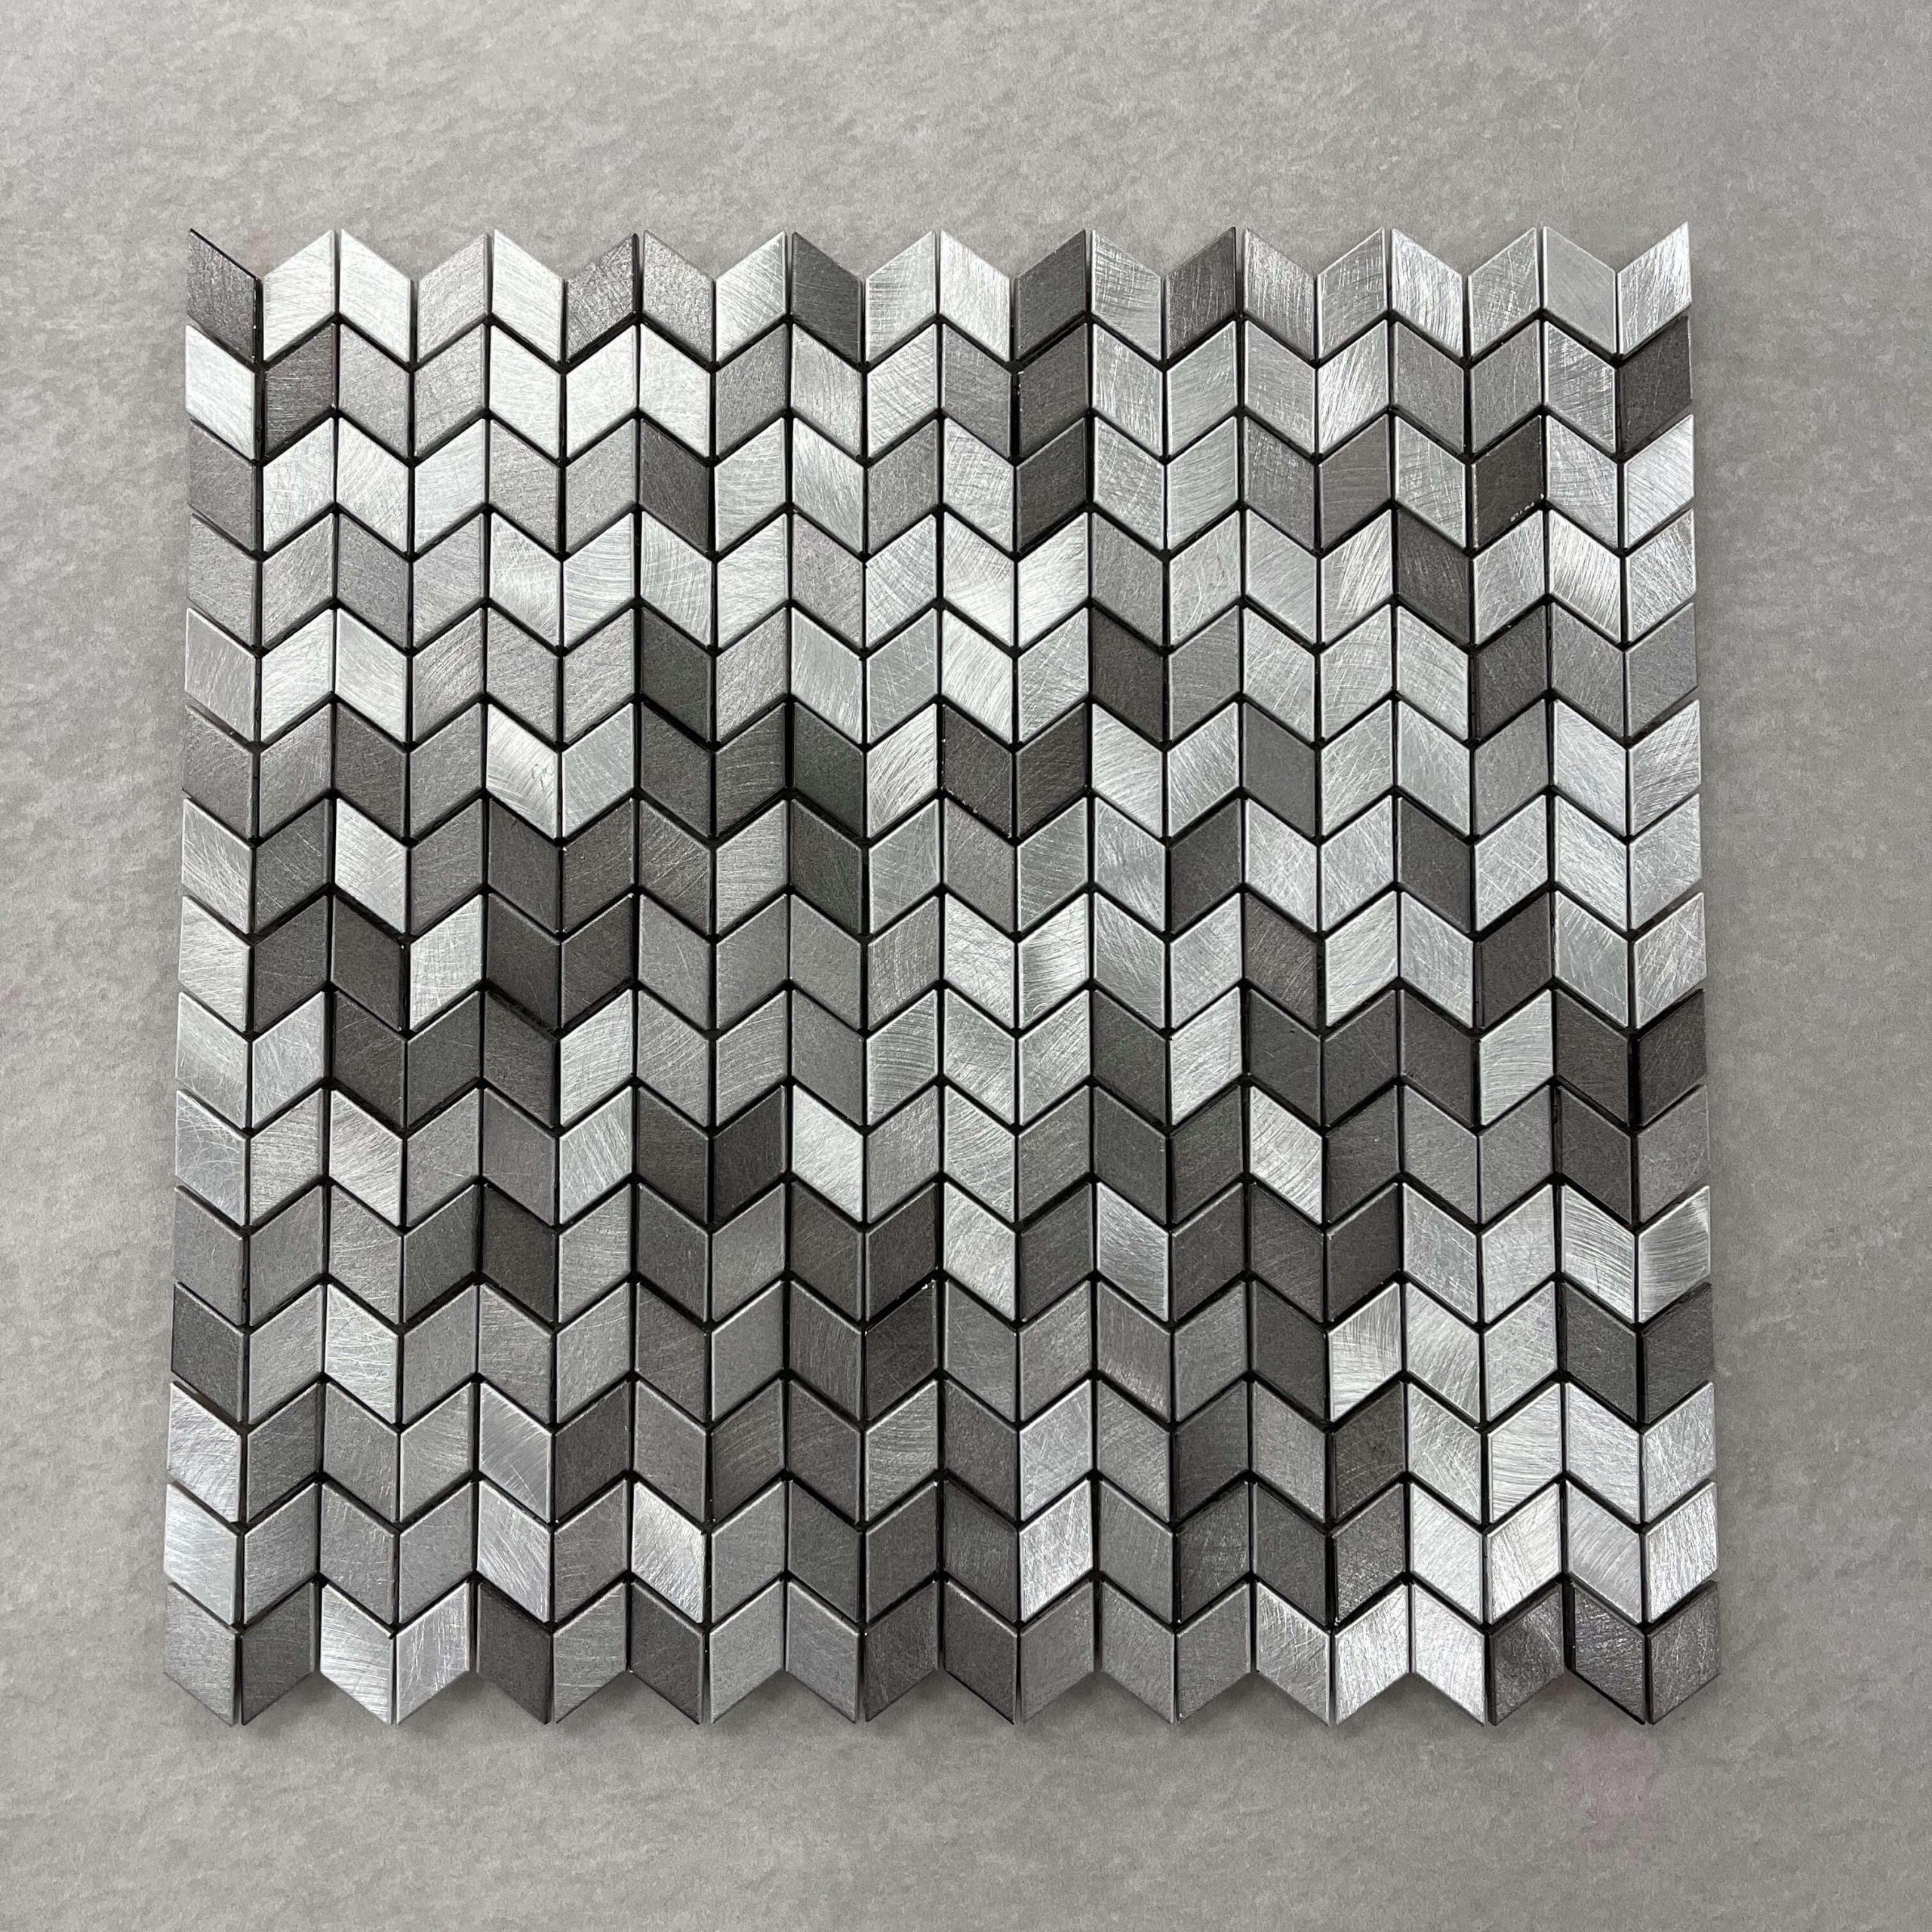 Brushed Aluminium Light Grey and Dark Grey Mosaic 7642